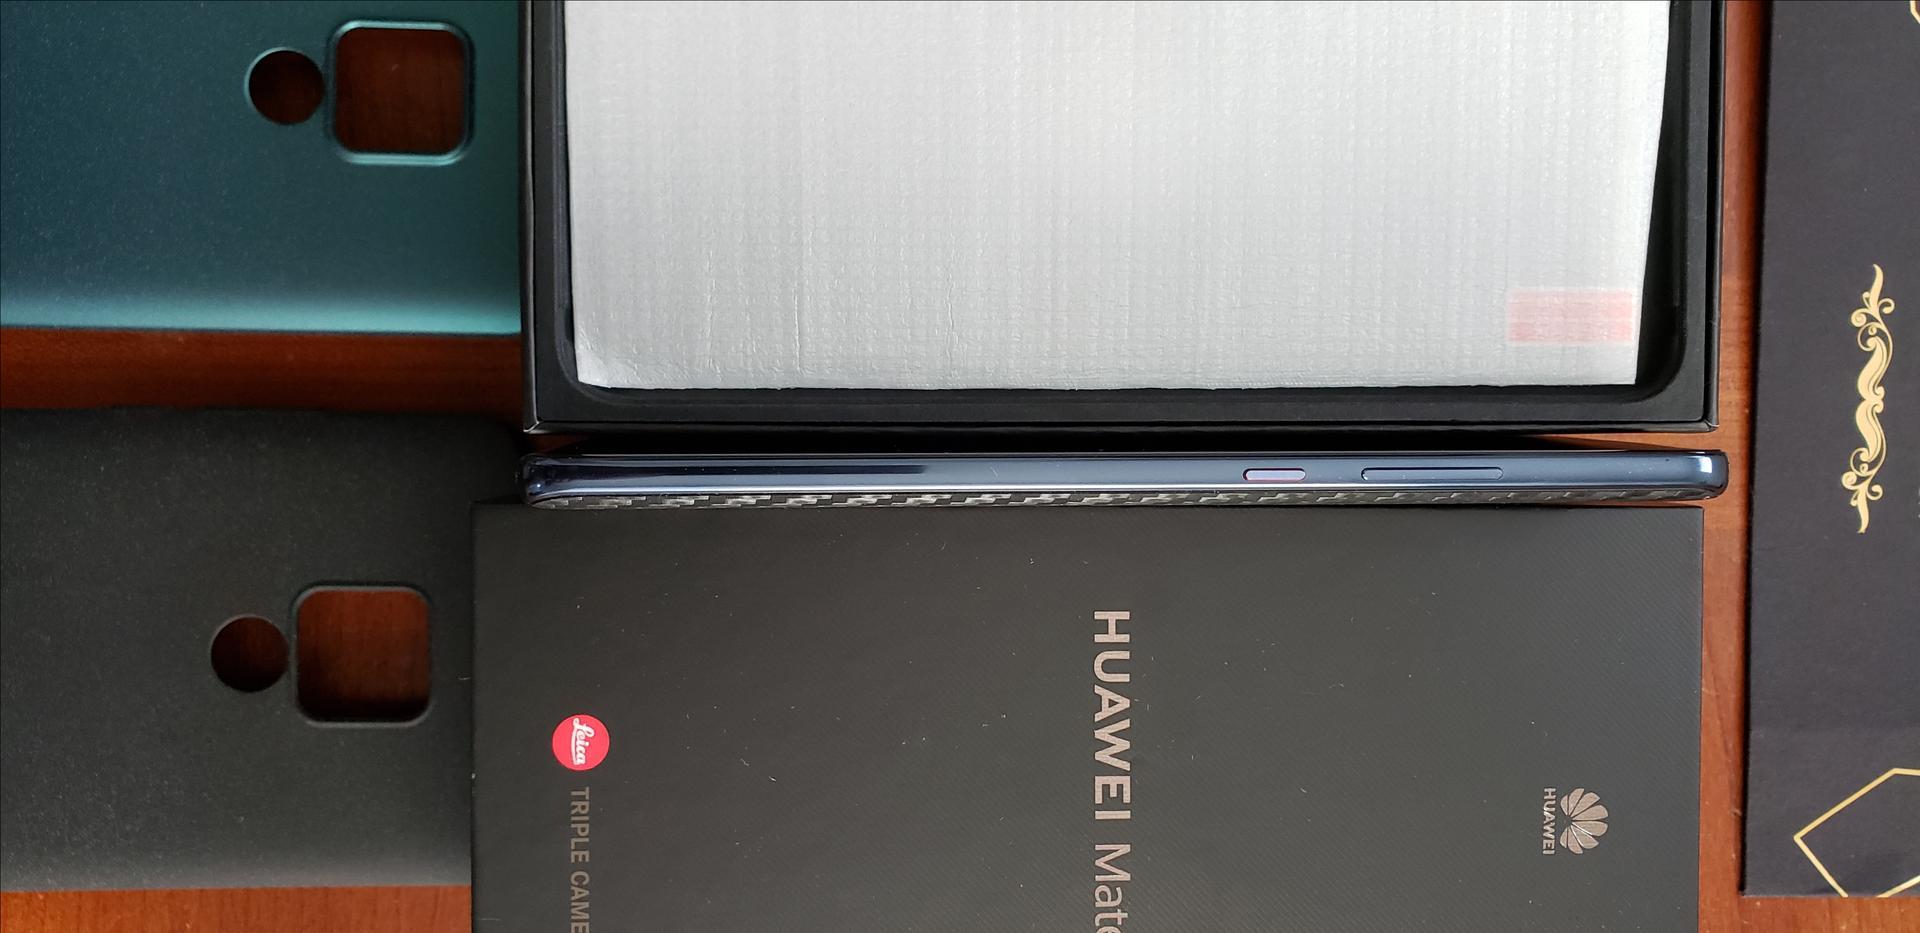 Huawei Mate 20 X (Unlocked) - Blue, 128 GB, 6 GB